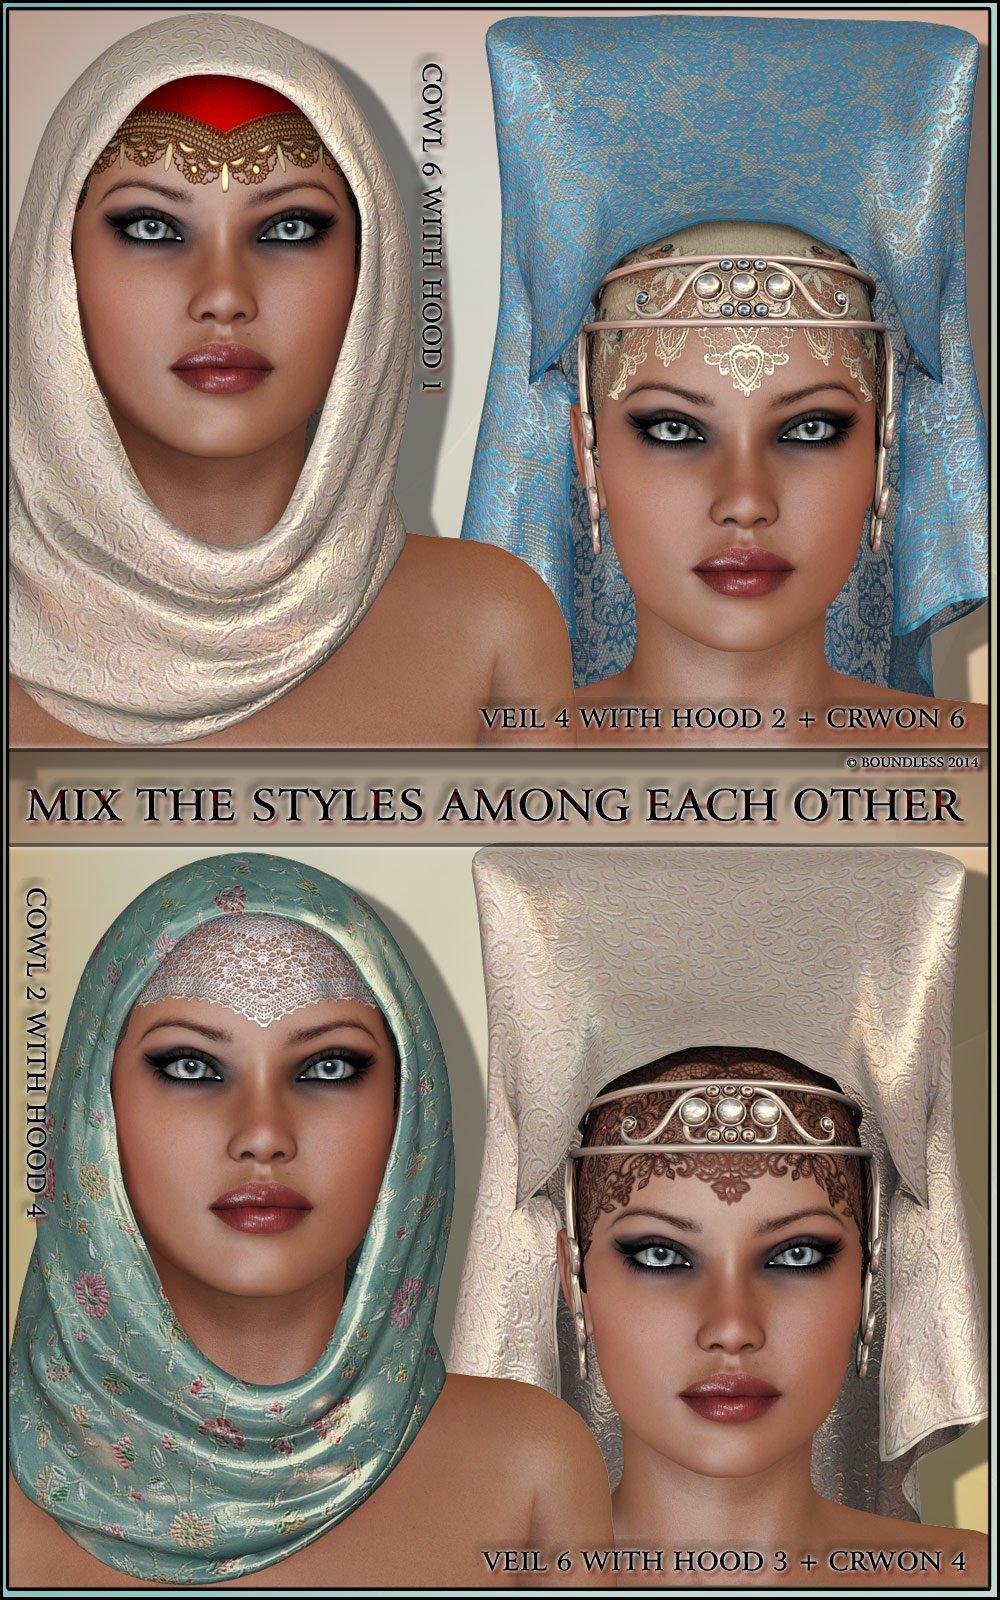 Oriental Fascination for Headdresses Grace